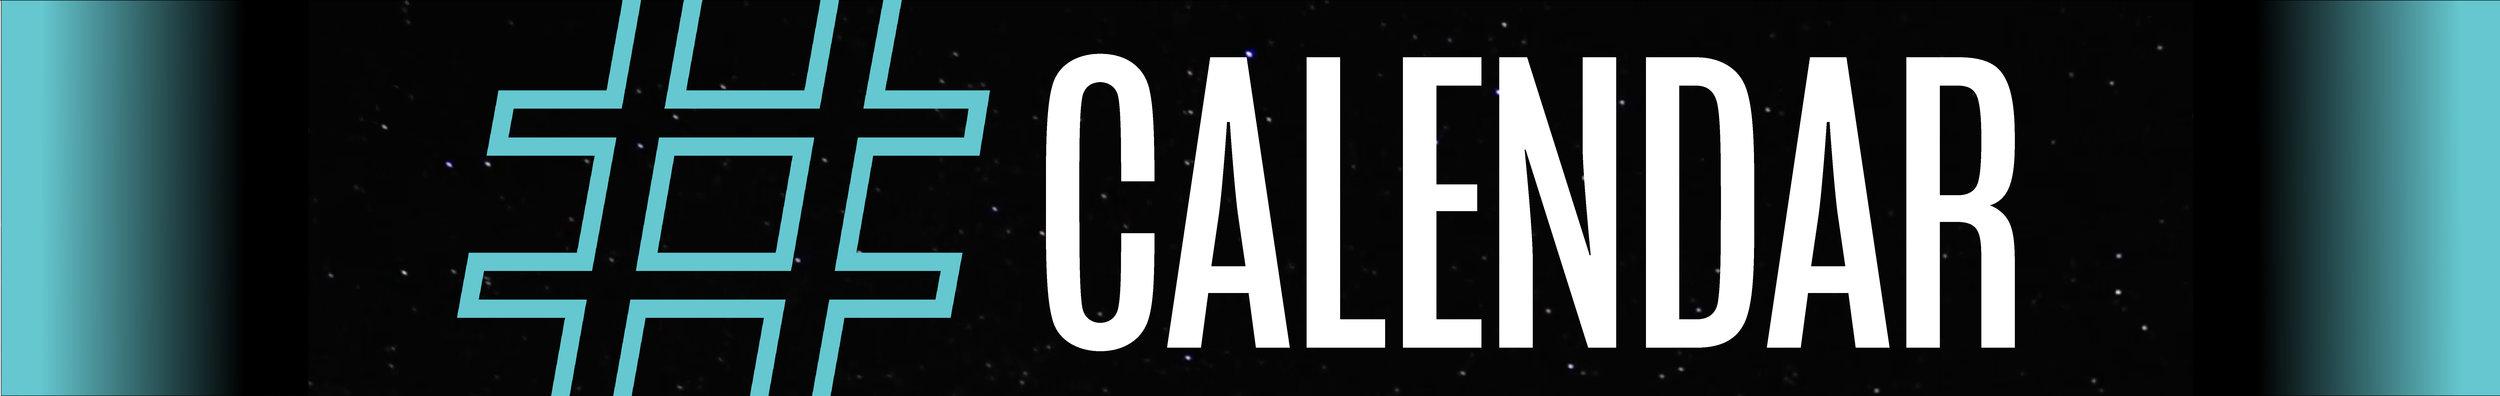 # CALENDAR BLACK COVER-01.jpg